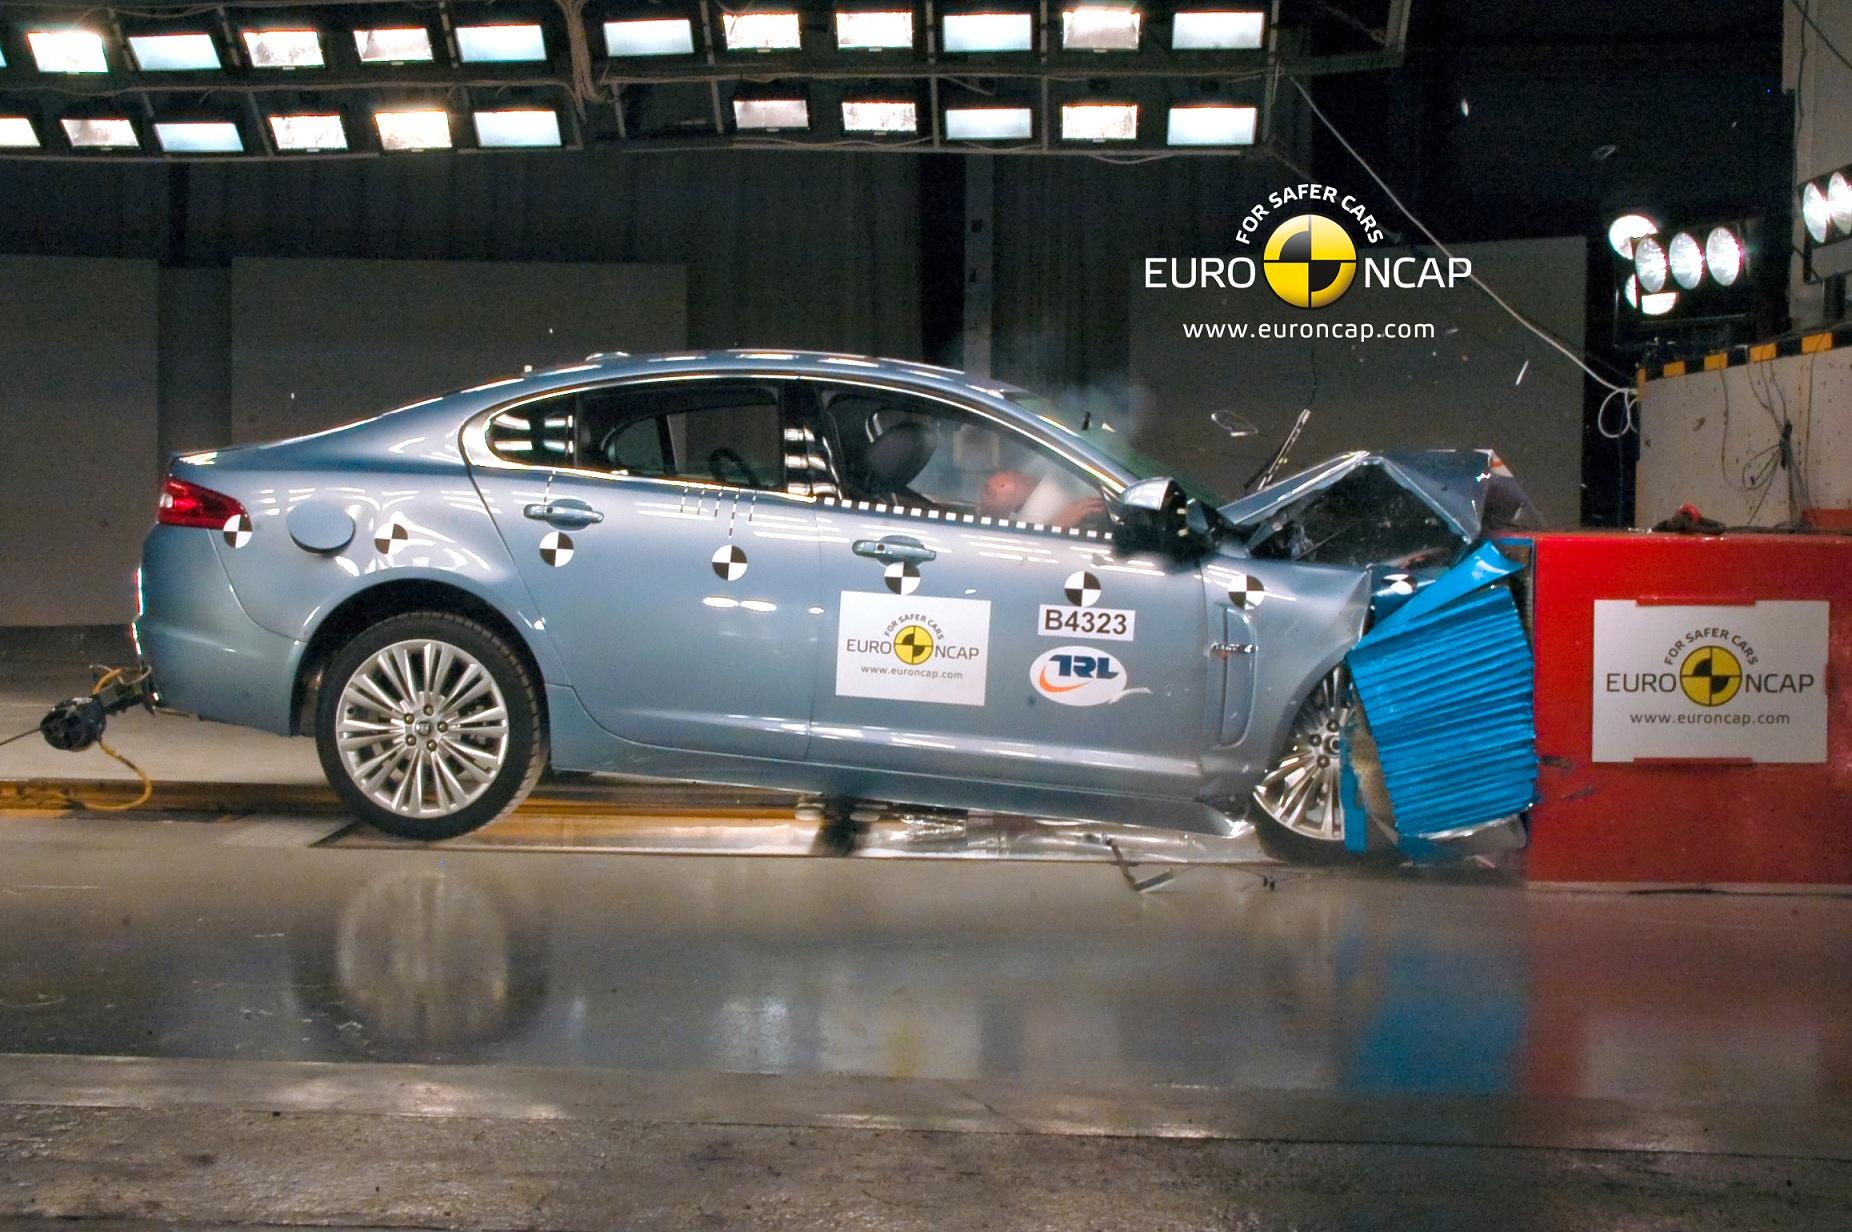 JAGUAR_XF_2011_Front- NCAP - Copy_1.jpg